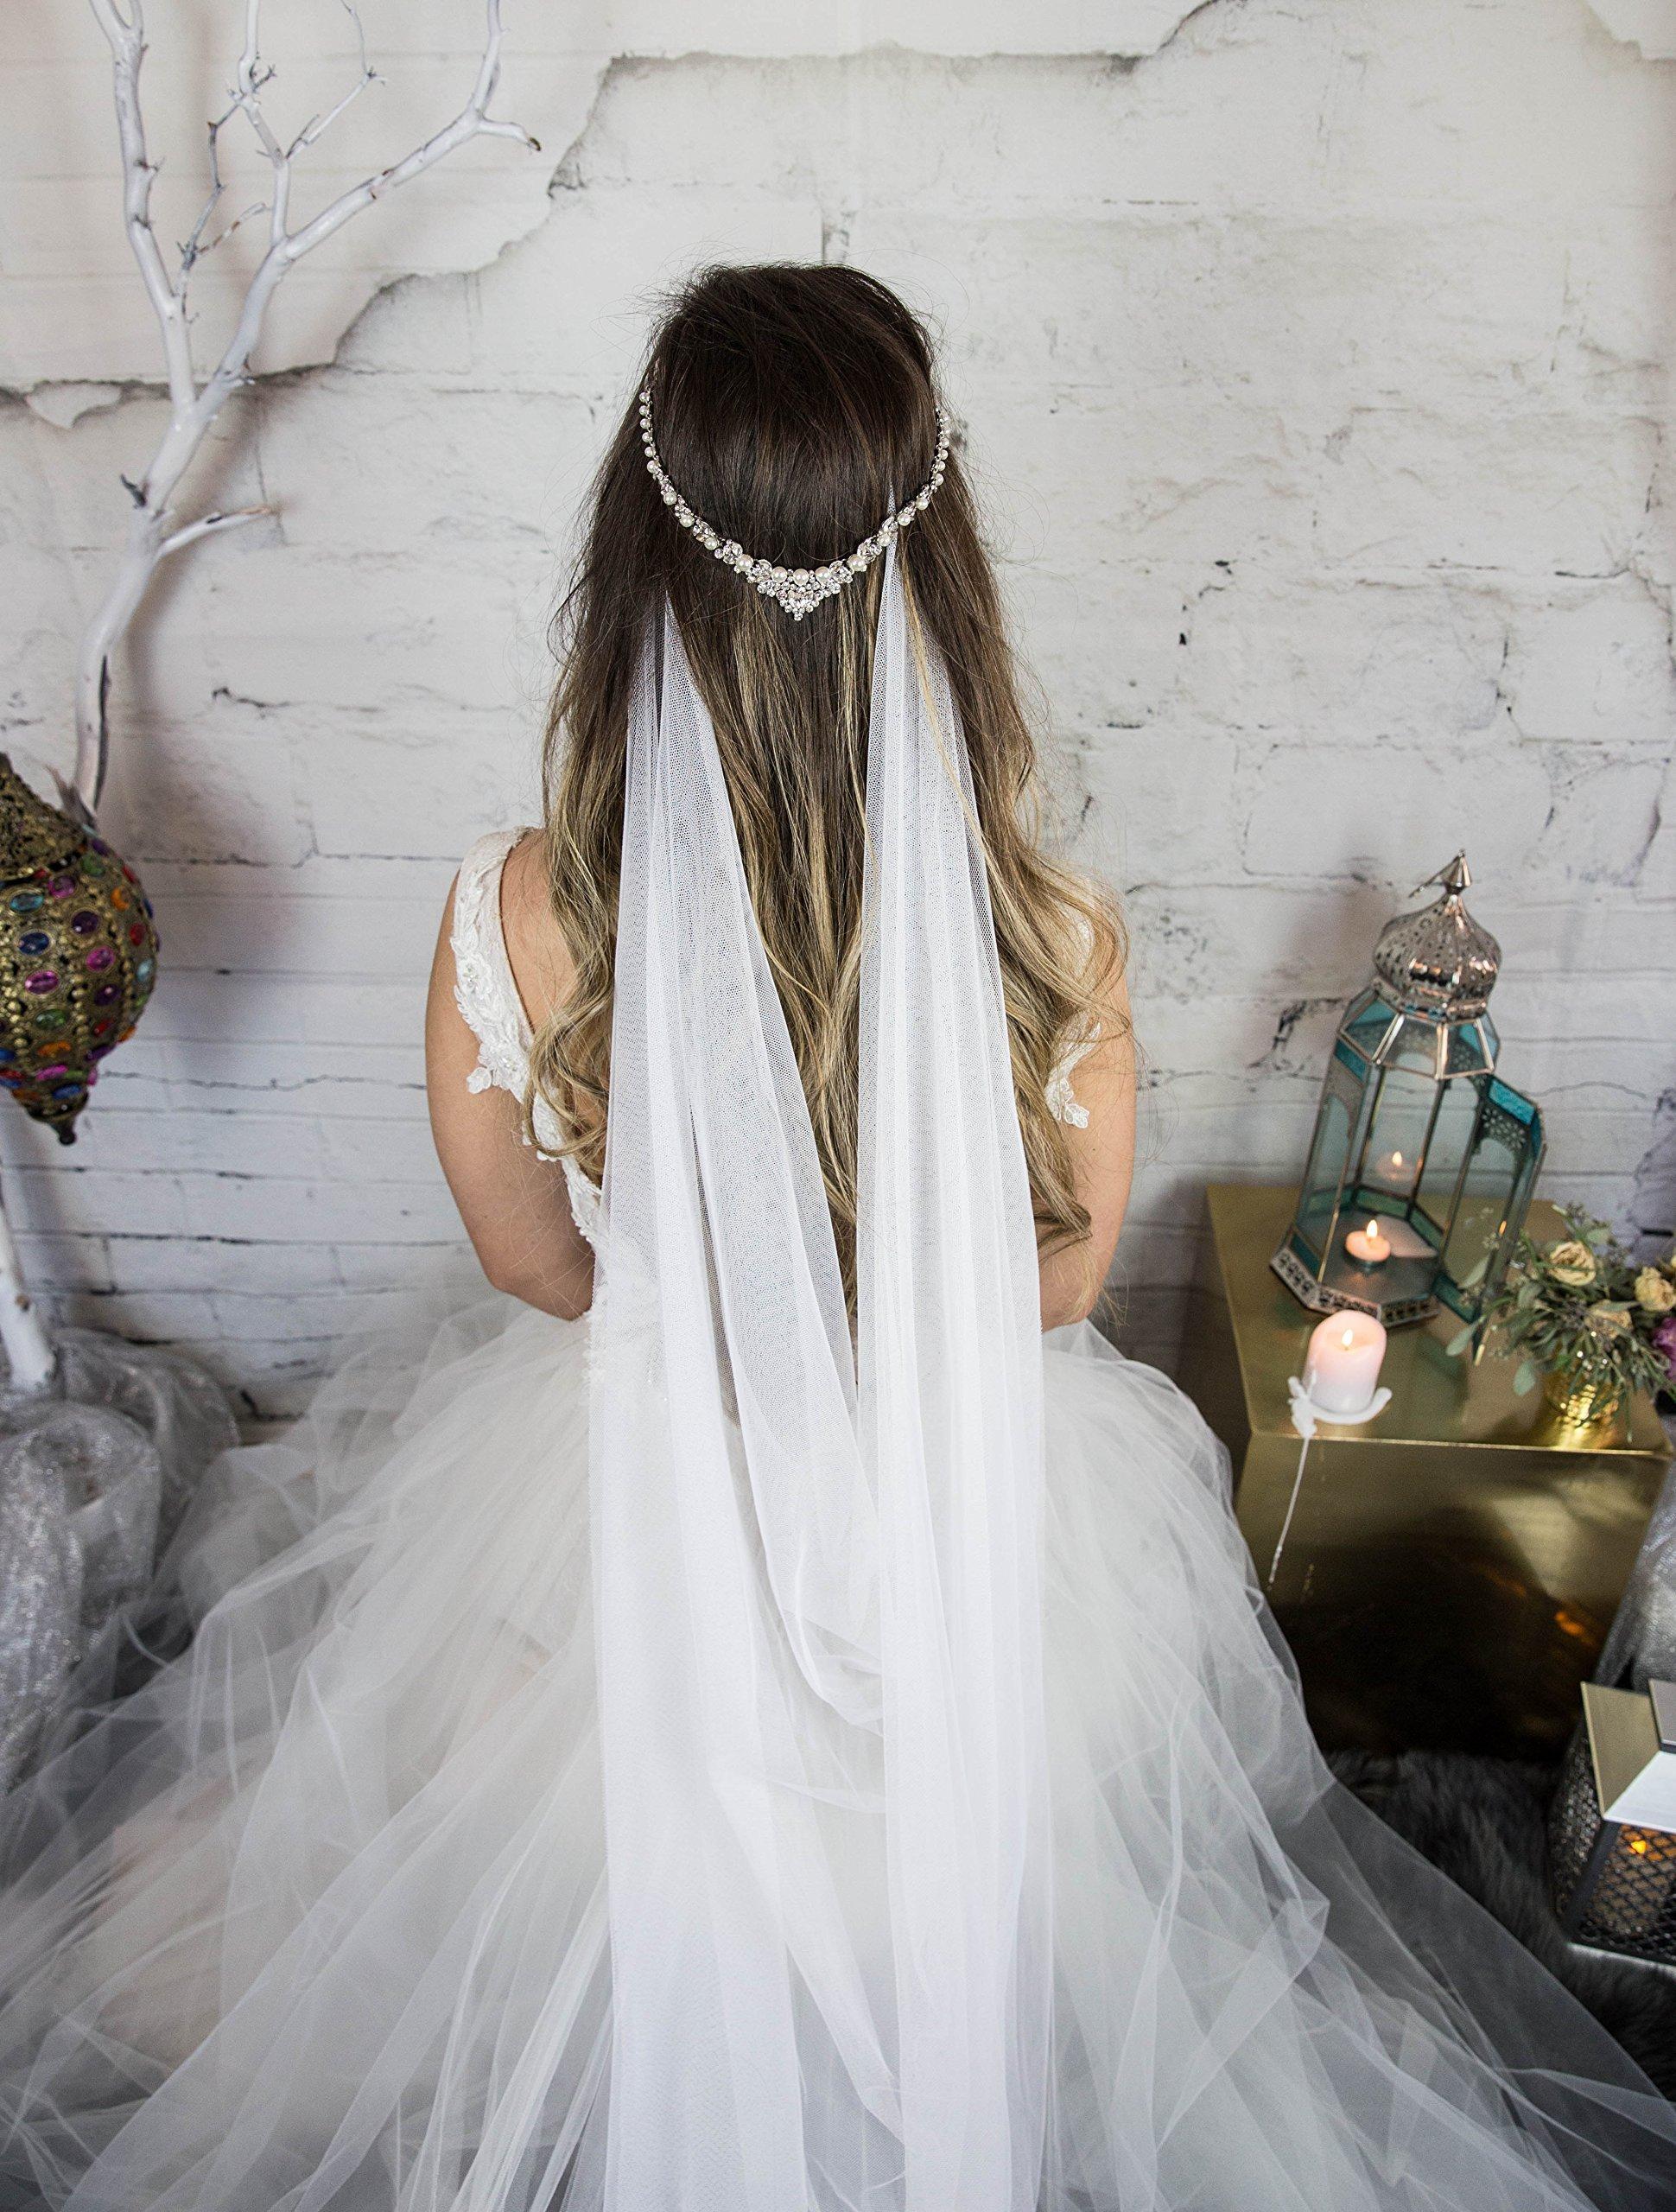 Pearl Headpiece, Bridal Head Chain, Wedding Hair Accessories, Silver Halo Hair Jewelry, Hair Comb for the Bride